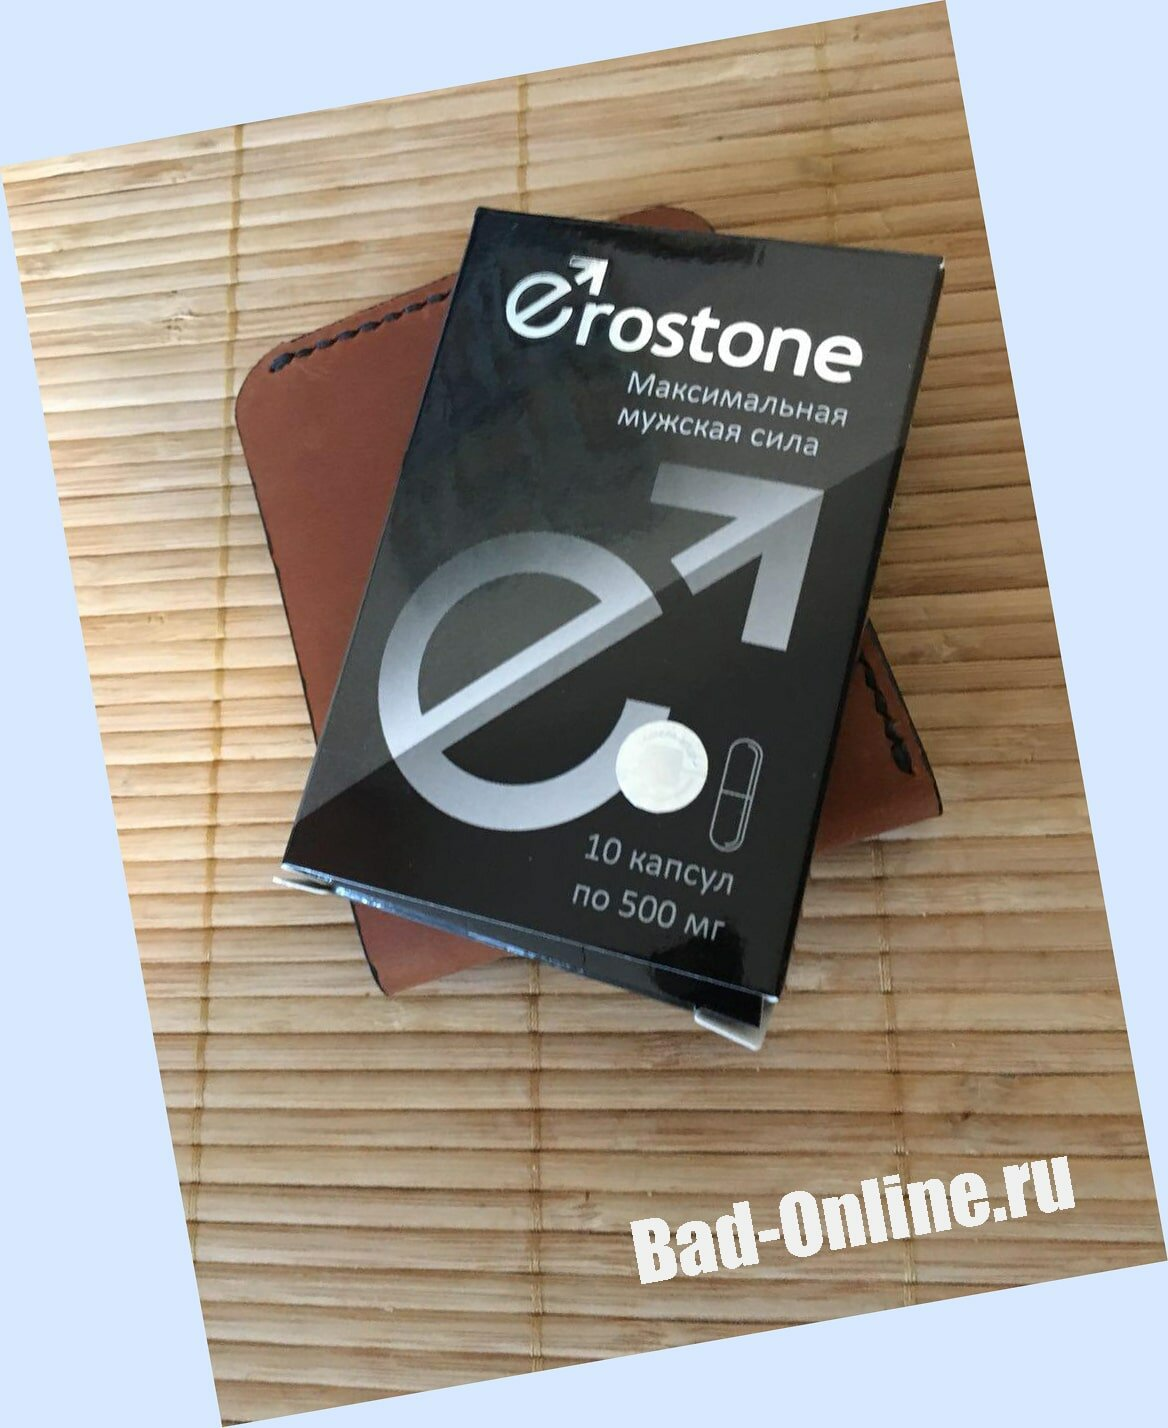 Erostone для потенции в Кировограде